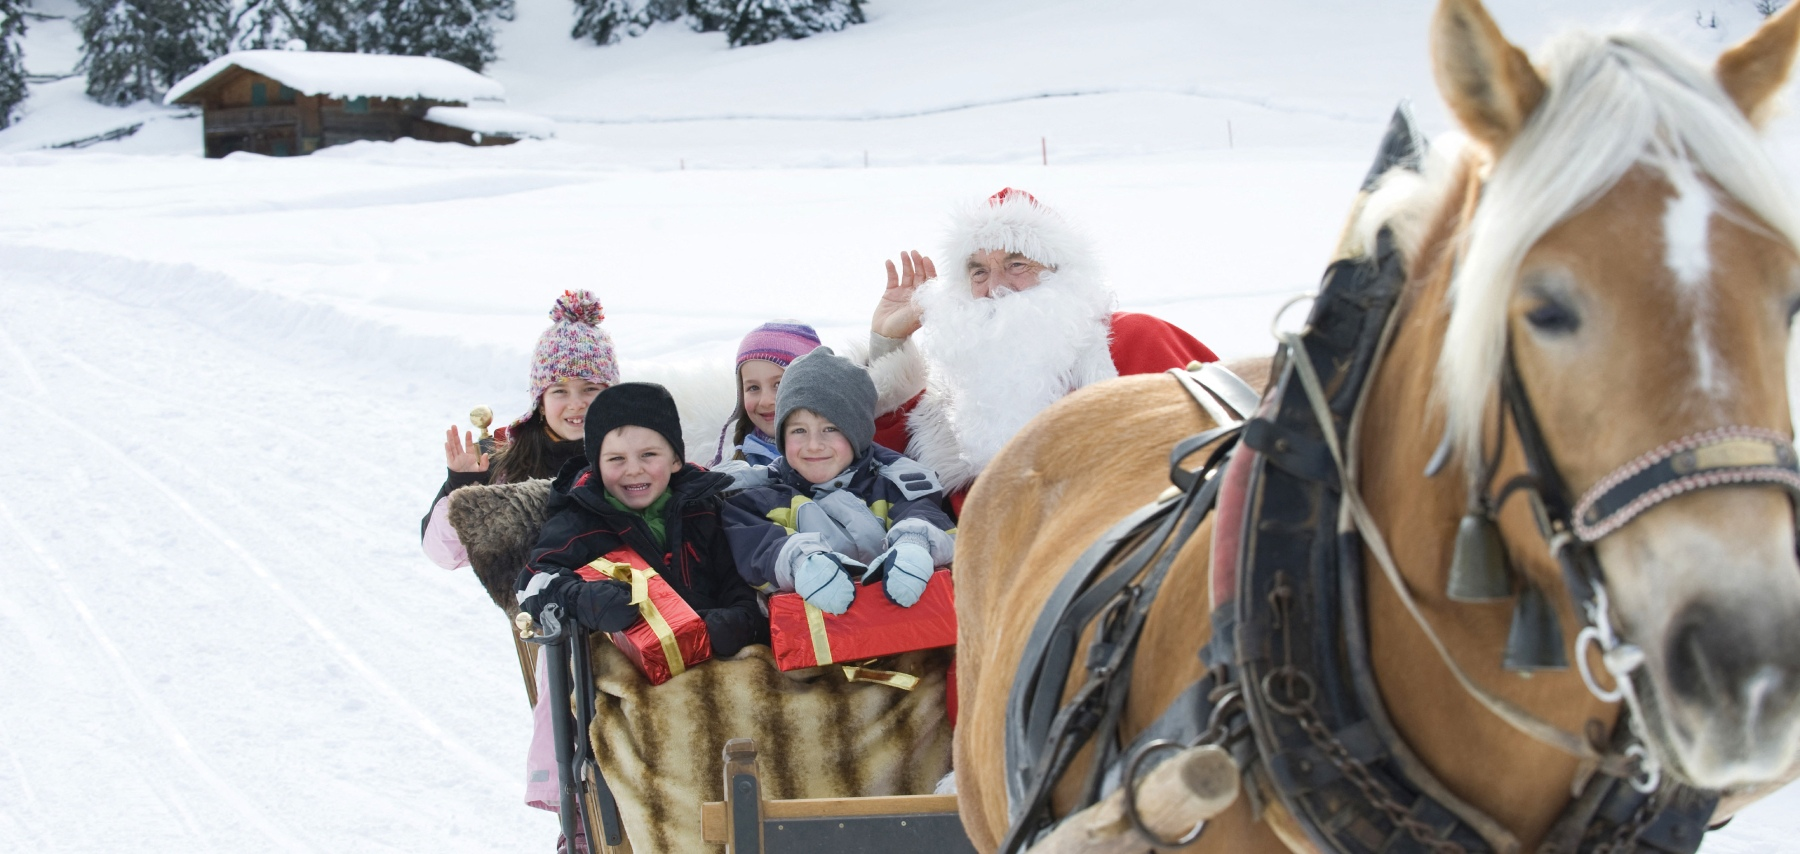 Arrival of Santa Claus - CGH Résidences